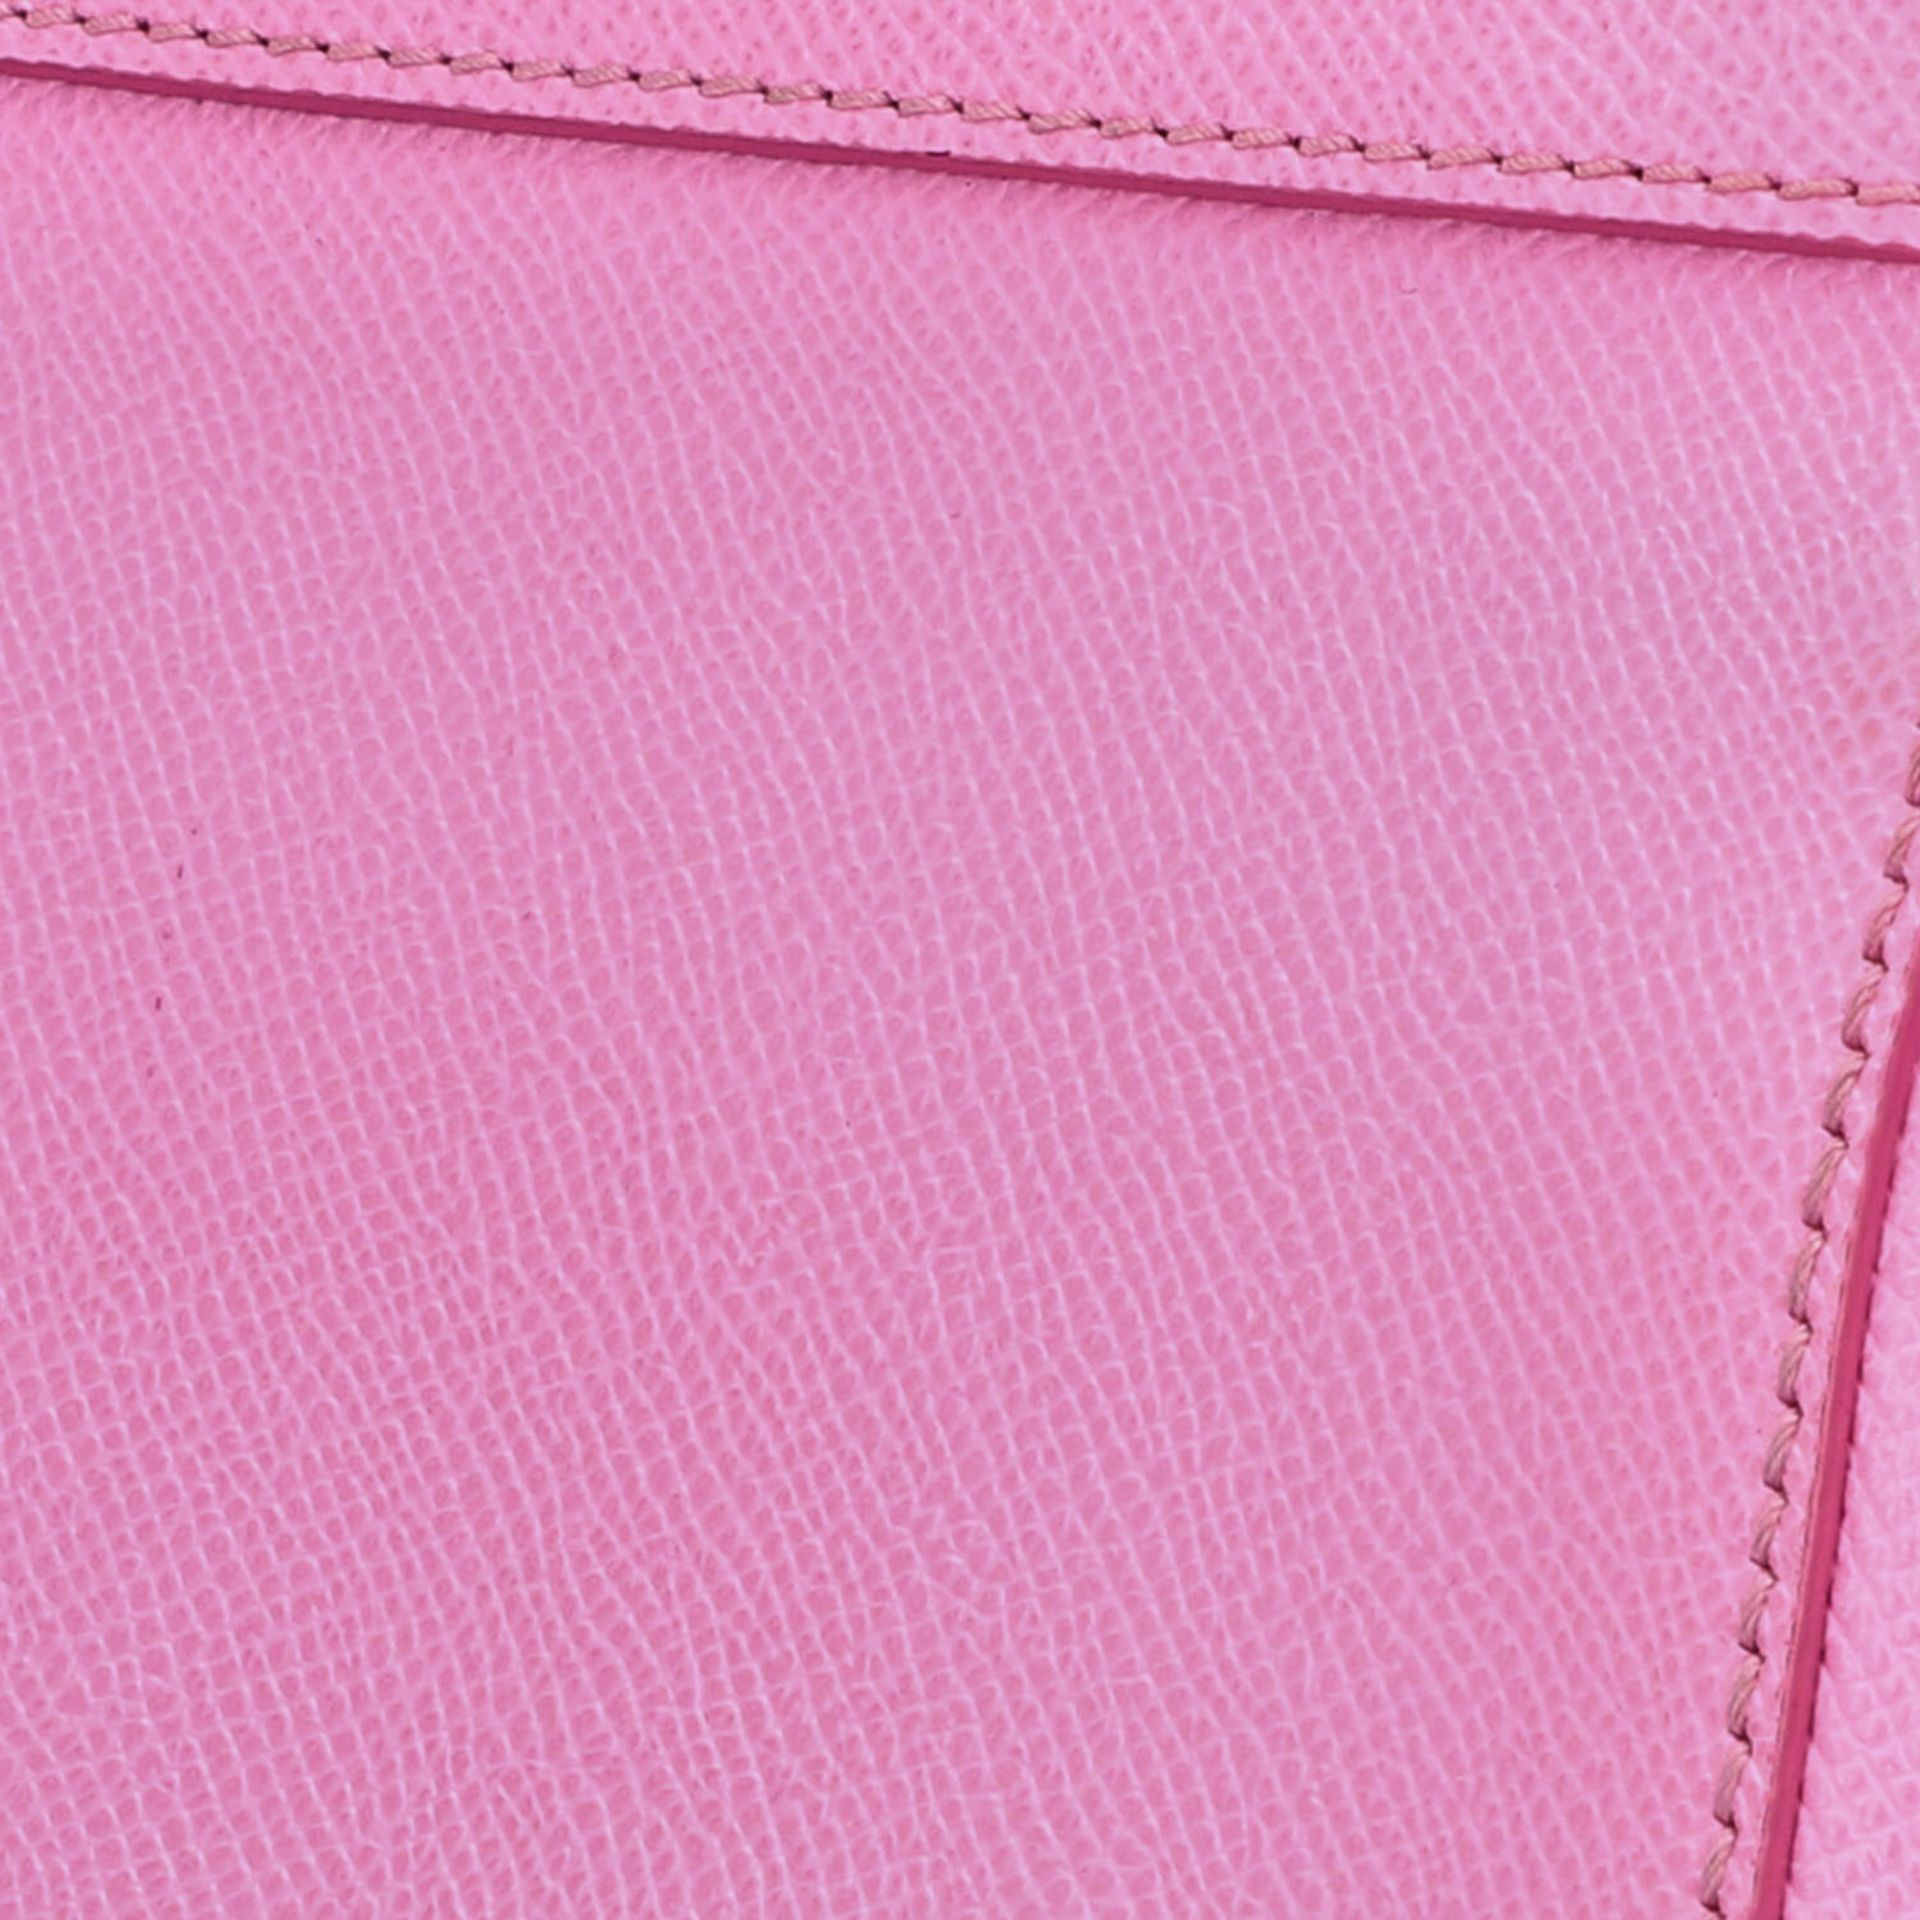 "DOLCE & GABBANA Handtasche ""MINI SICILY"", akt. NP.: 1.150,-€.Fein genarbtes Leder in - Image 7 of 8"